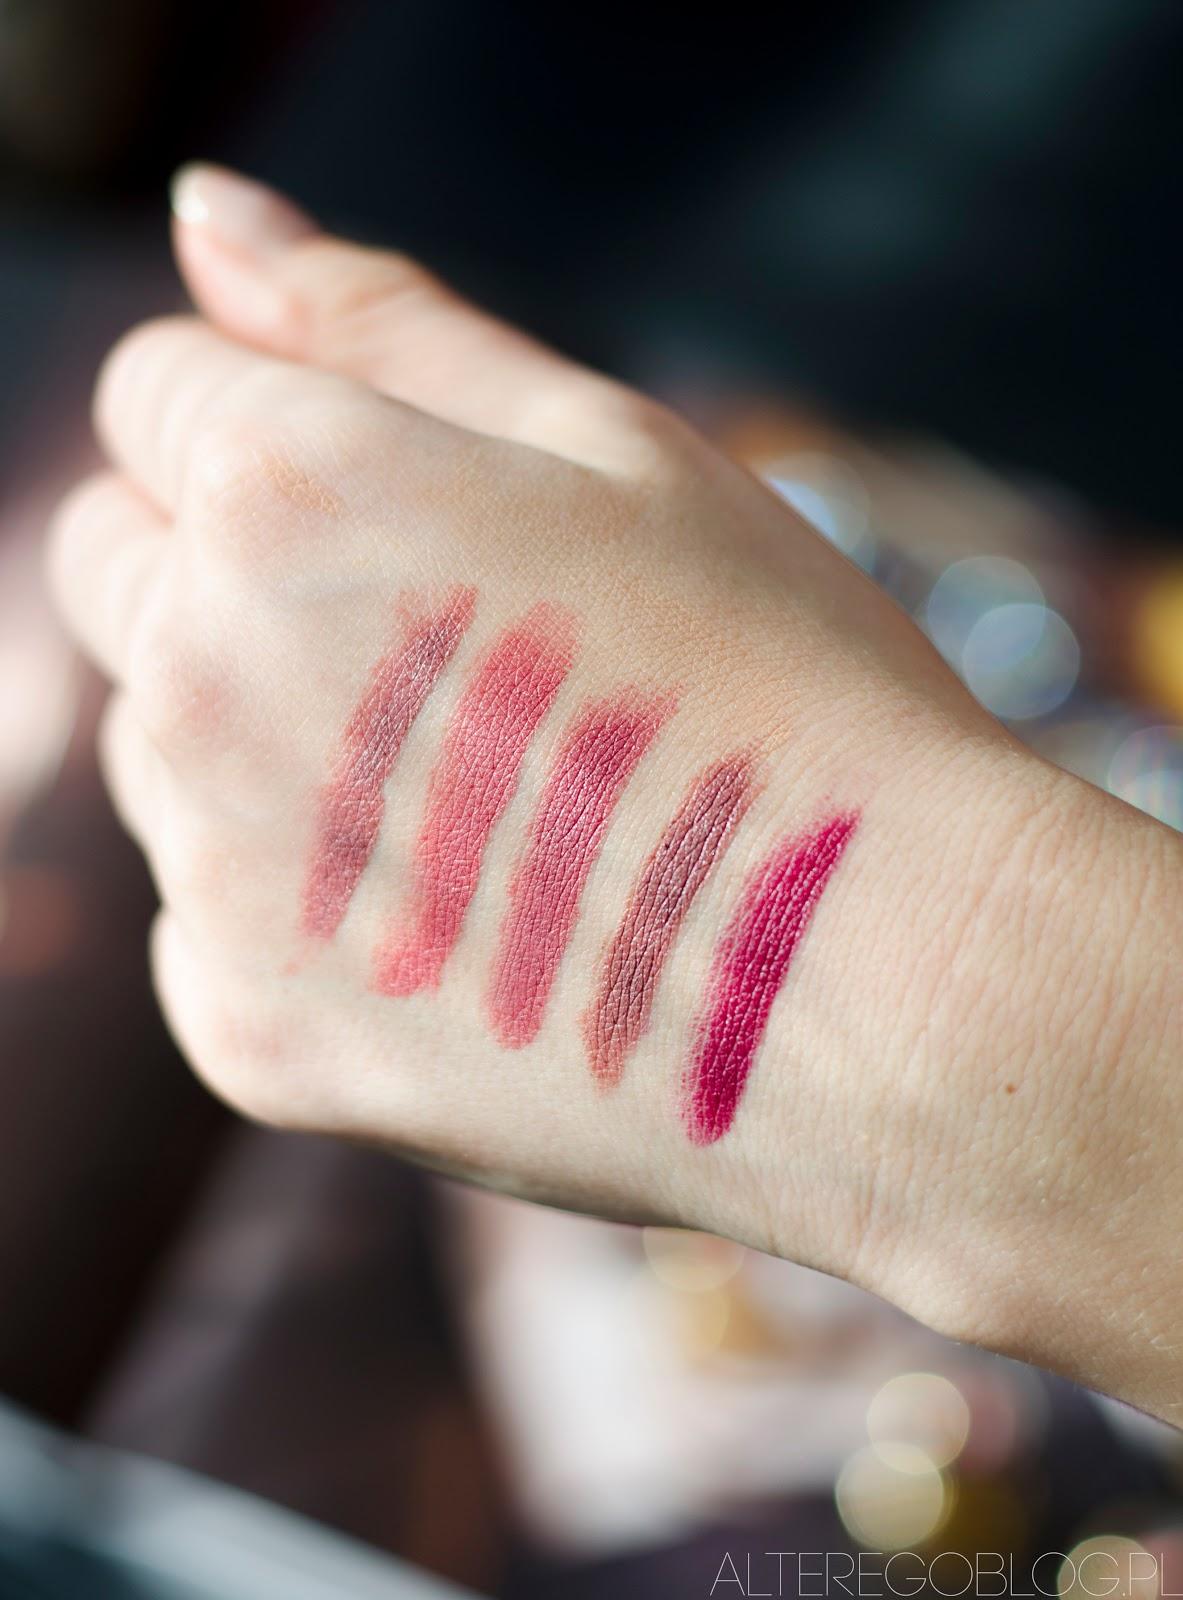 kobo matte lips, kobo matte lips edycja limitowana, kobo matte lips 413, 414, 415, 416, 417, matte lips recenzja, matte lips recenzja blog